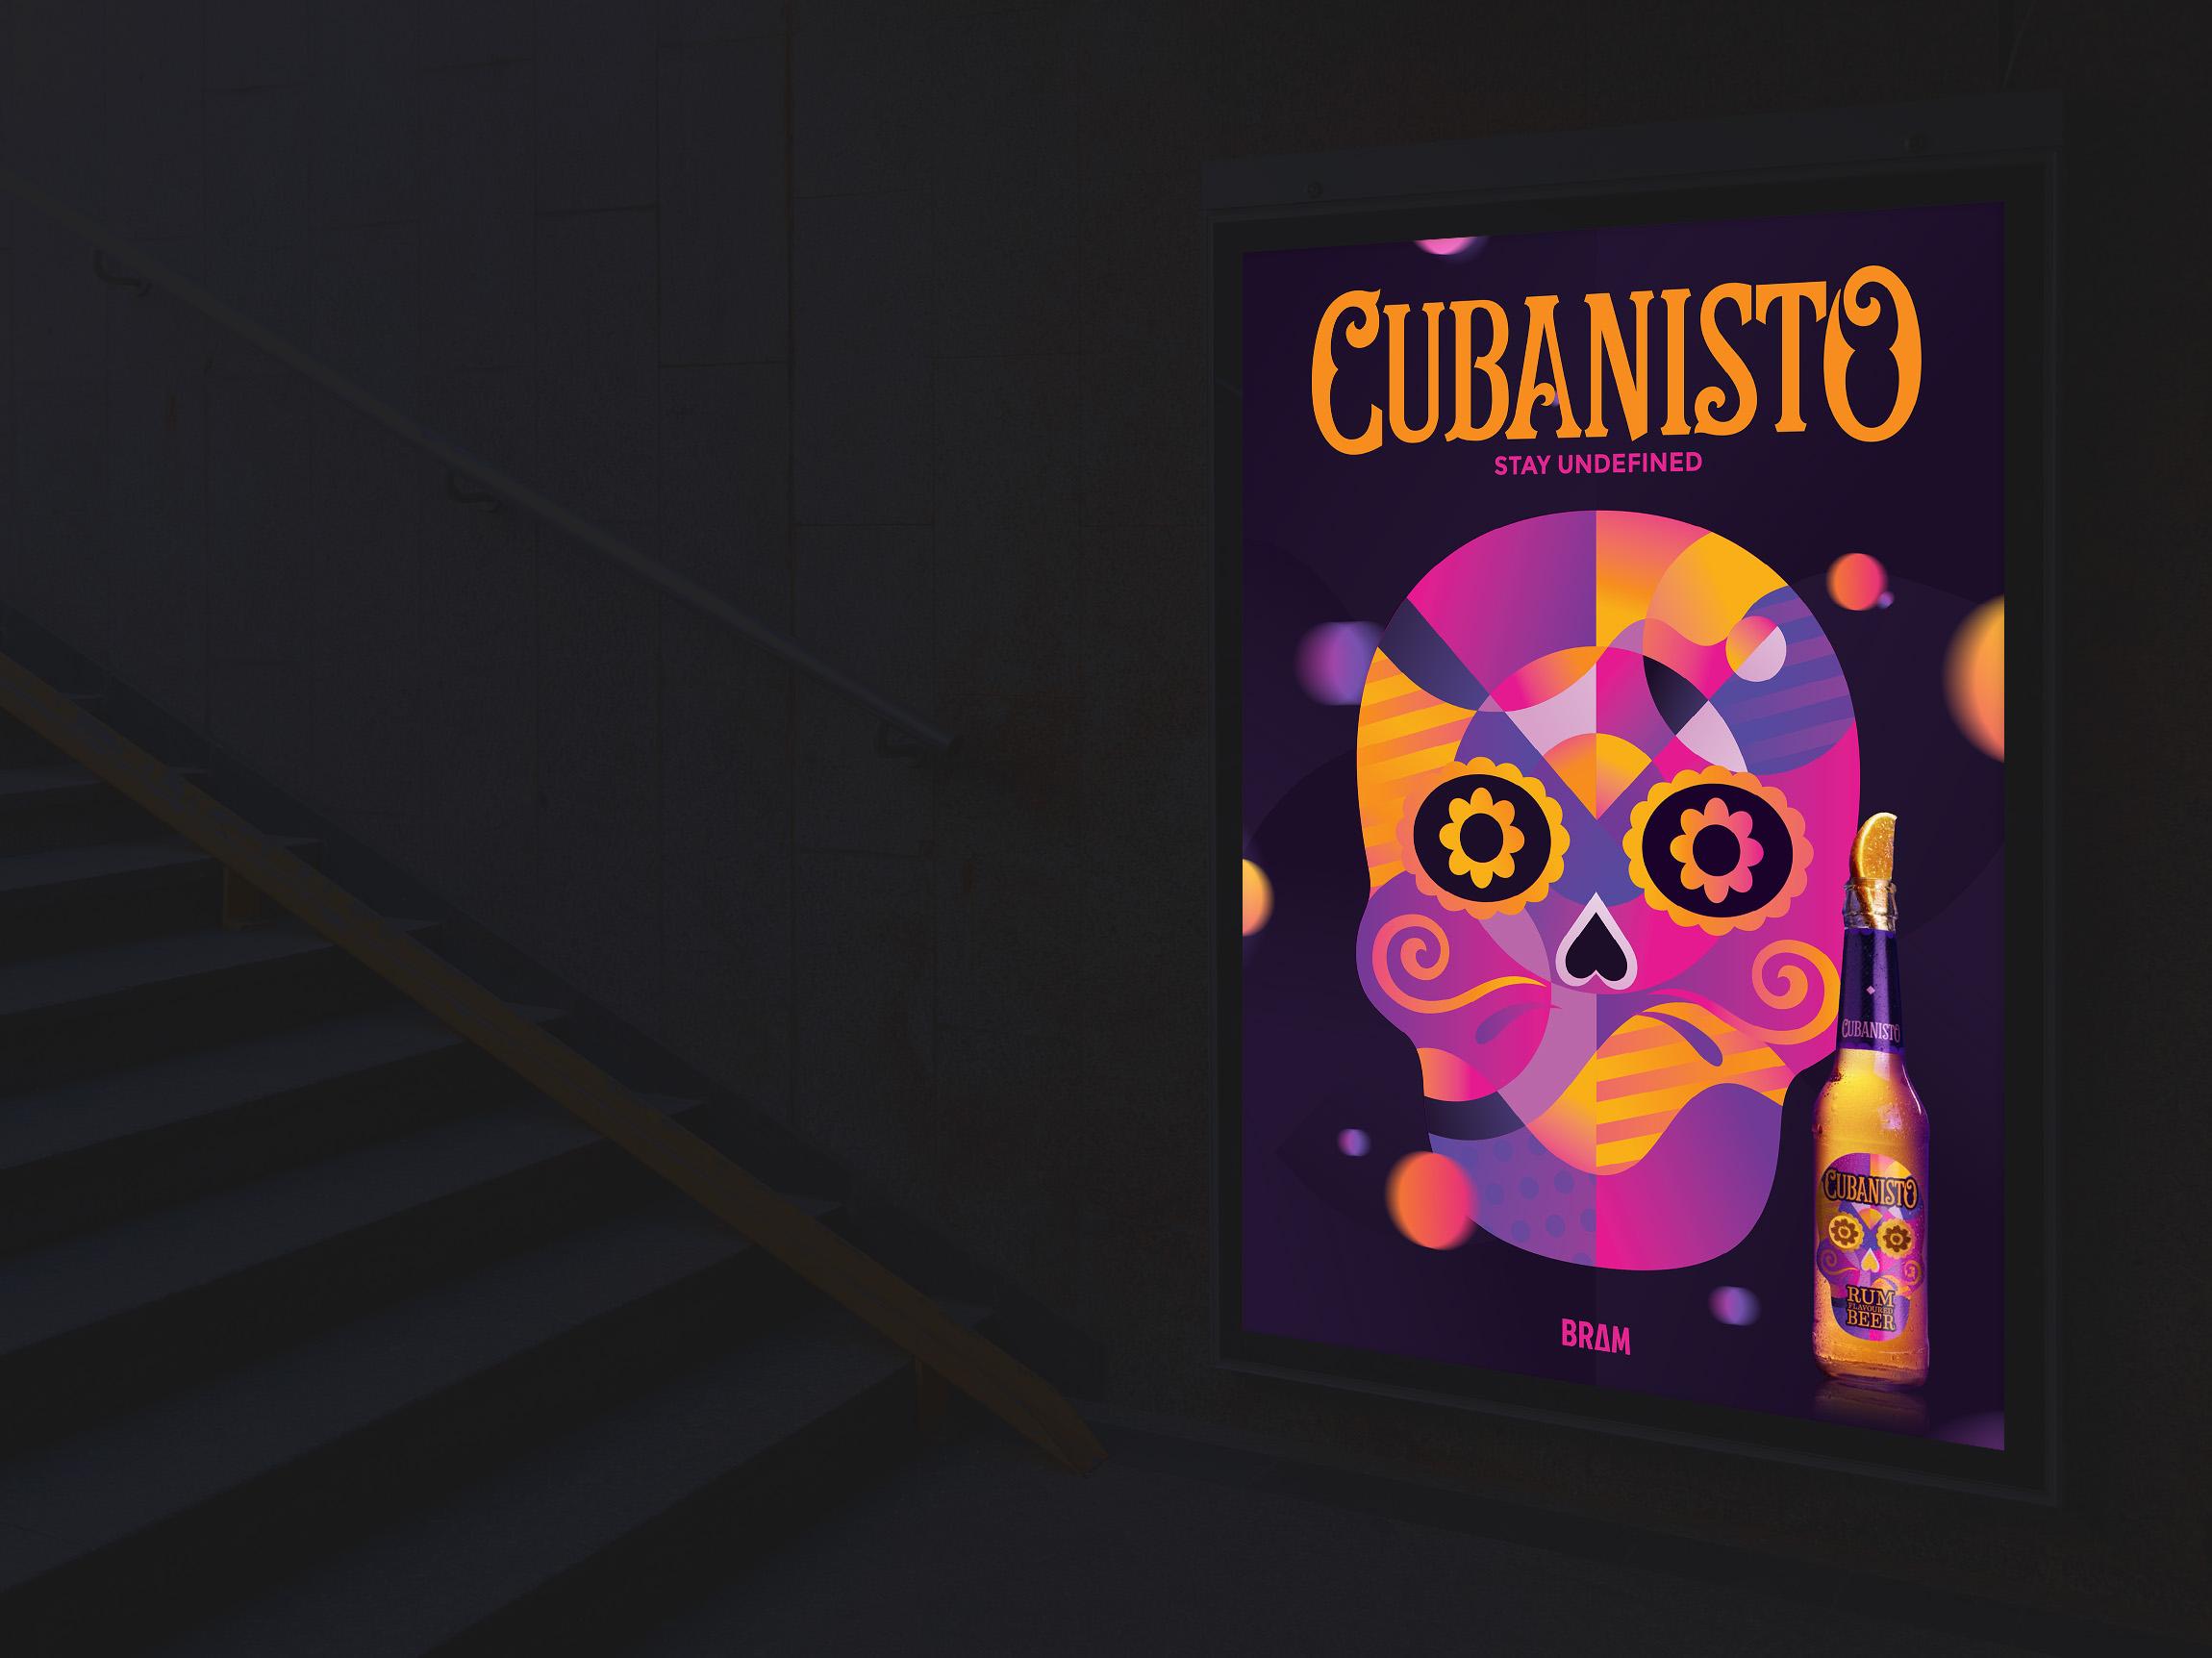 Cubanisto-underground